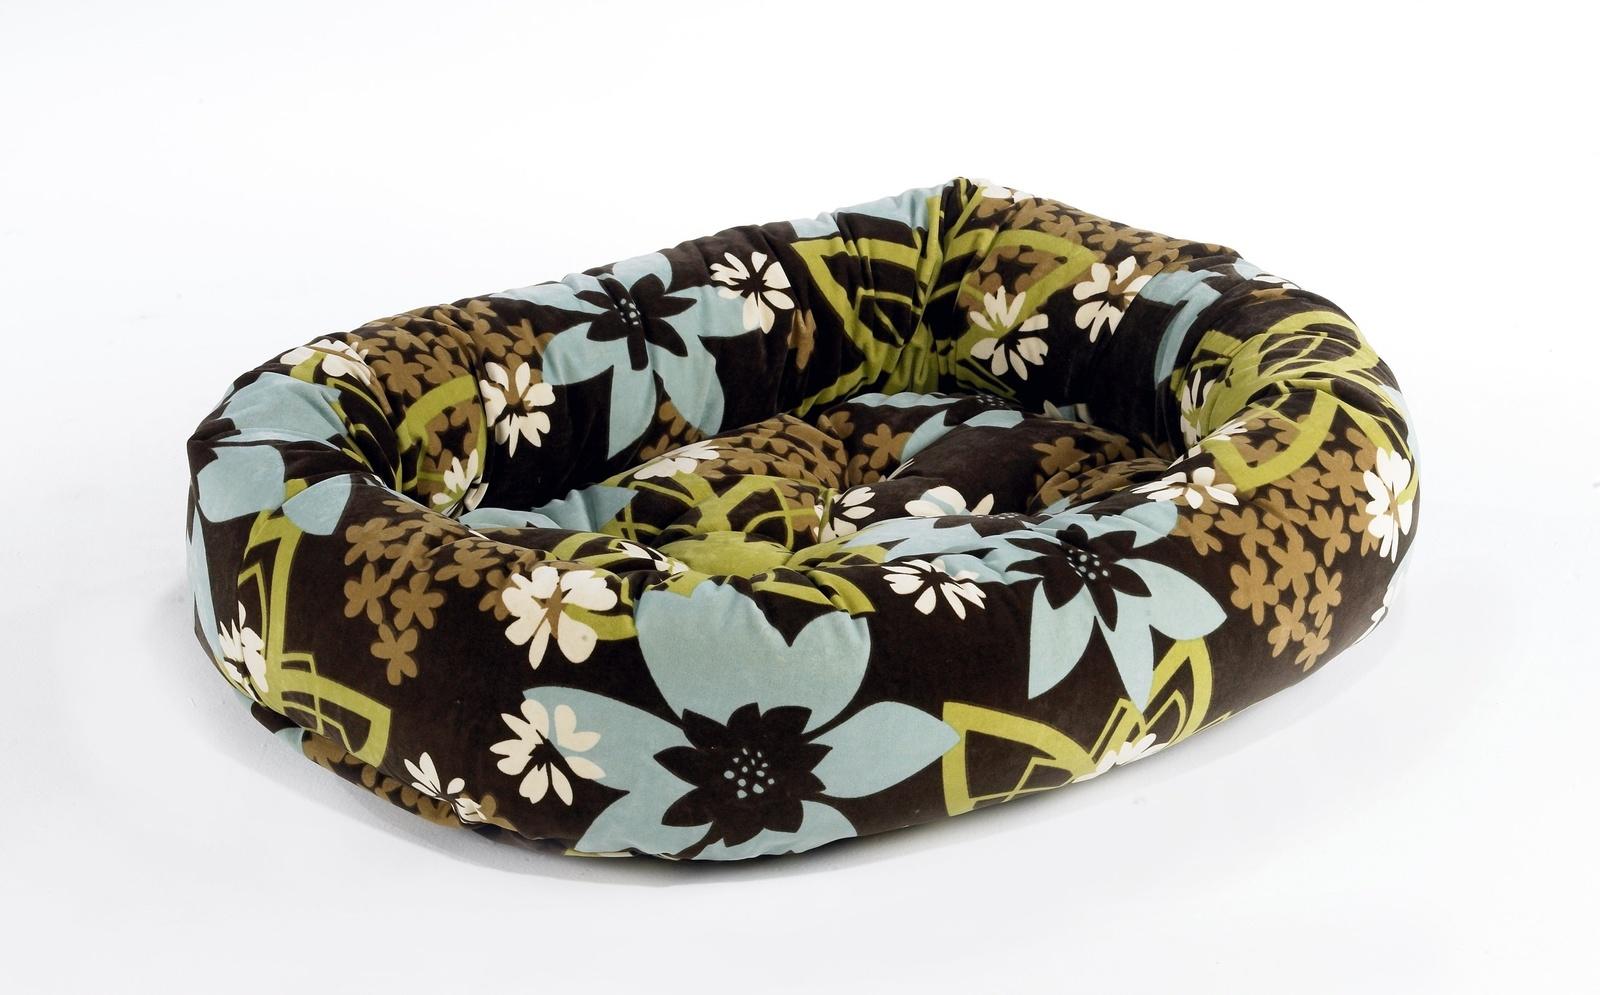 Bowser company Domut Bed doughnut bed XS size St Tropez